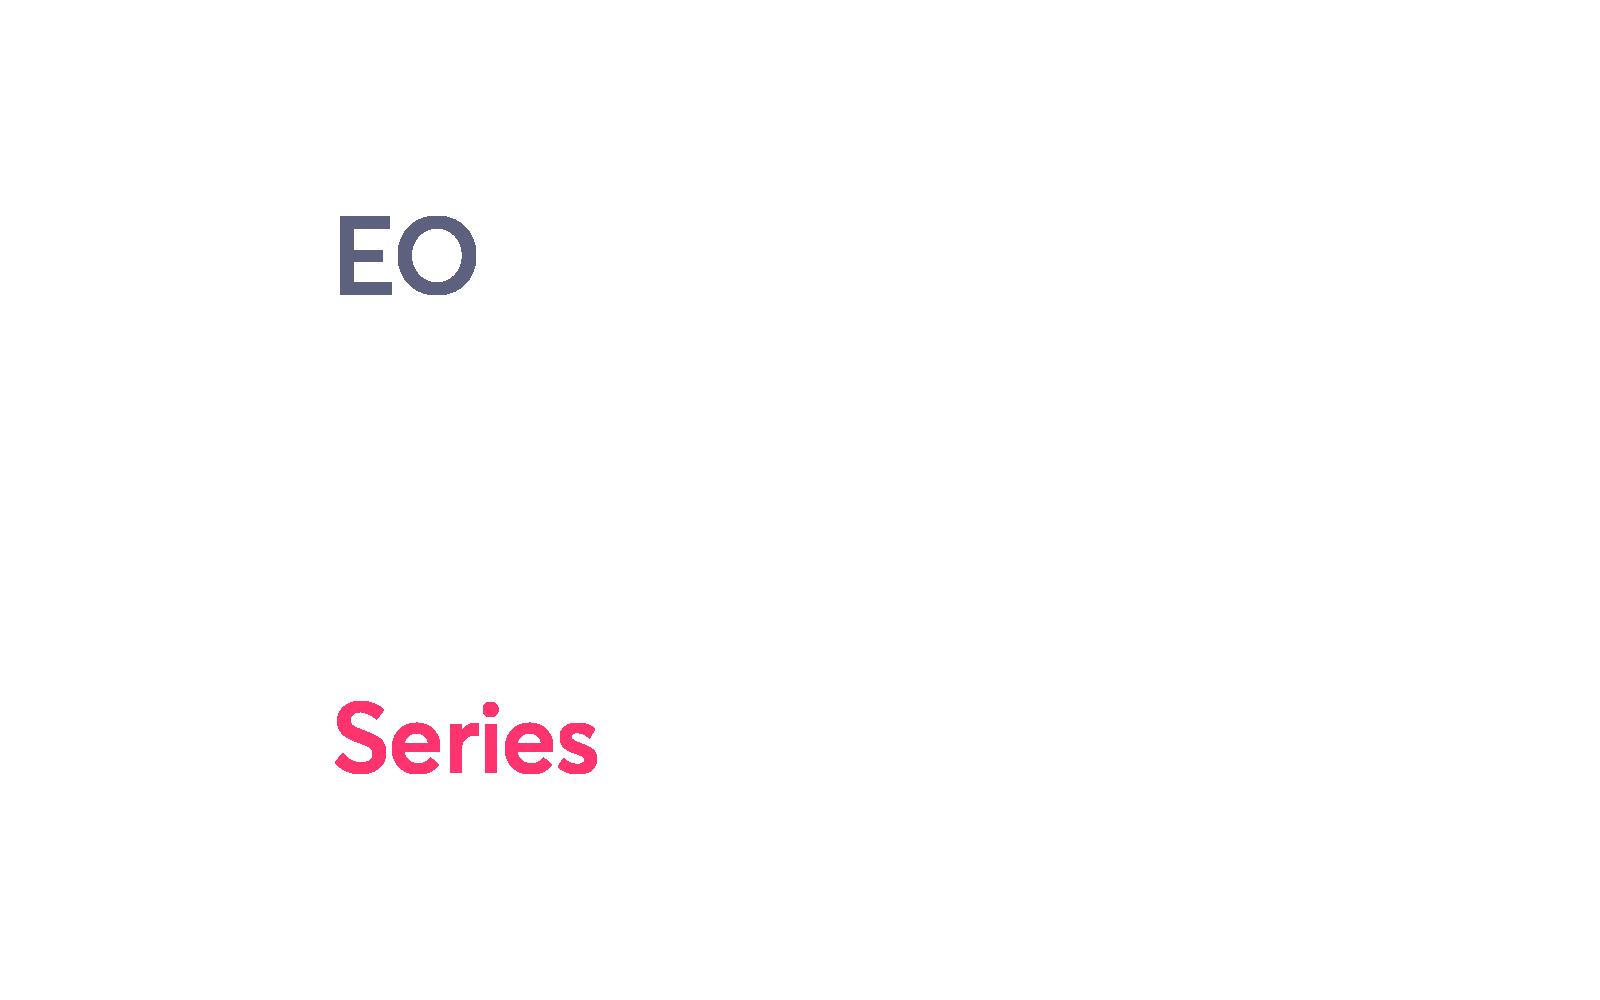 Powerhouse Series type treatment